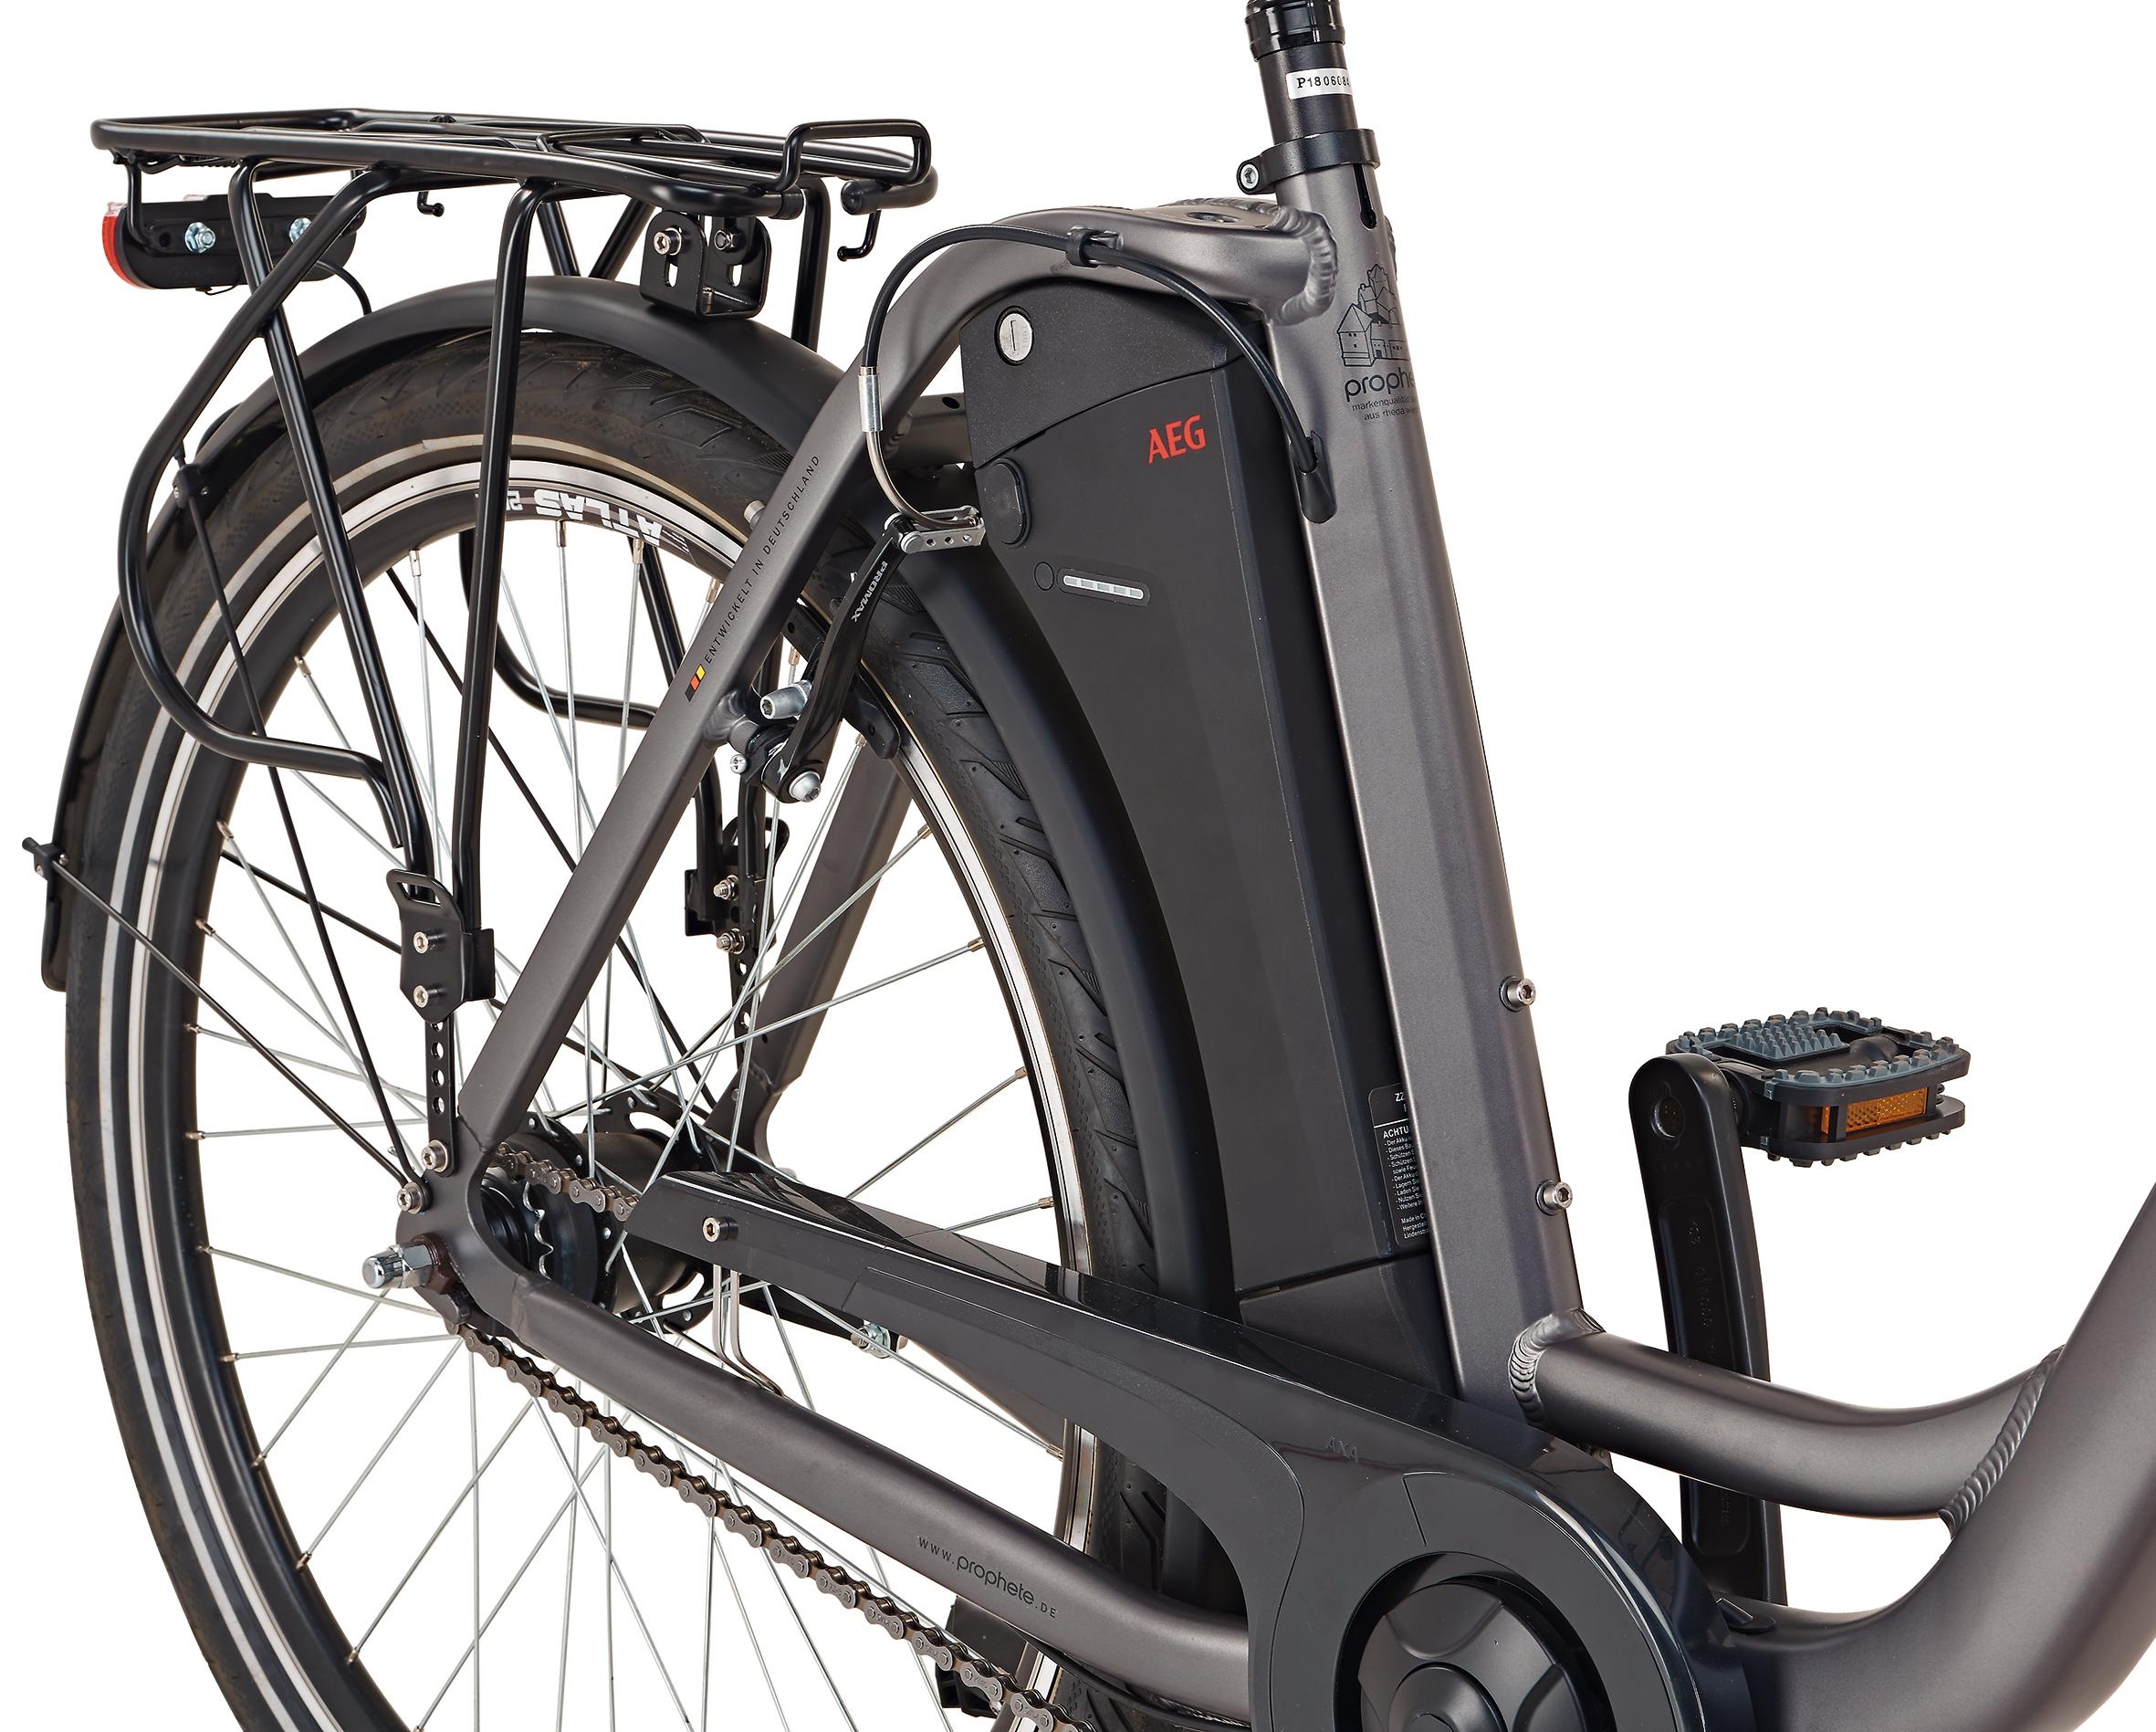 "Prophete Elektrofahrrad / E-Bike Geniesser e9.5 City E-Bike 26"" grau Bild 5"